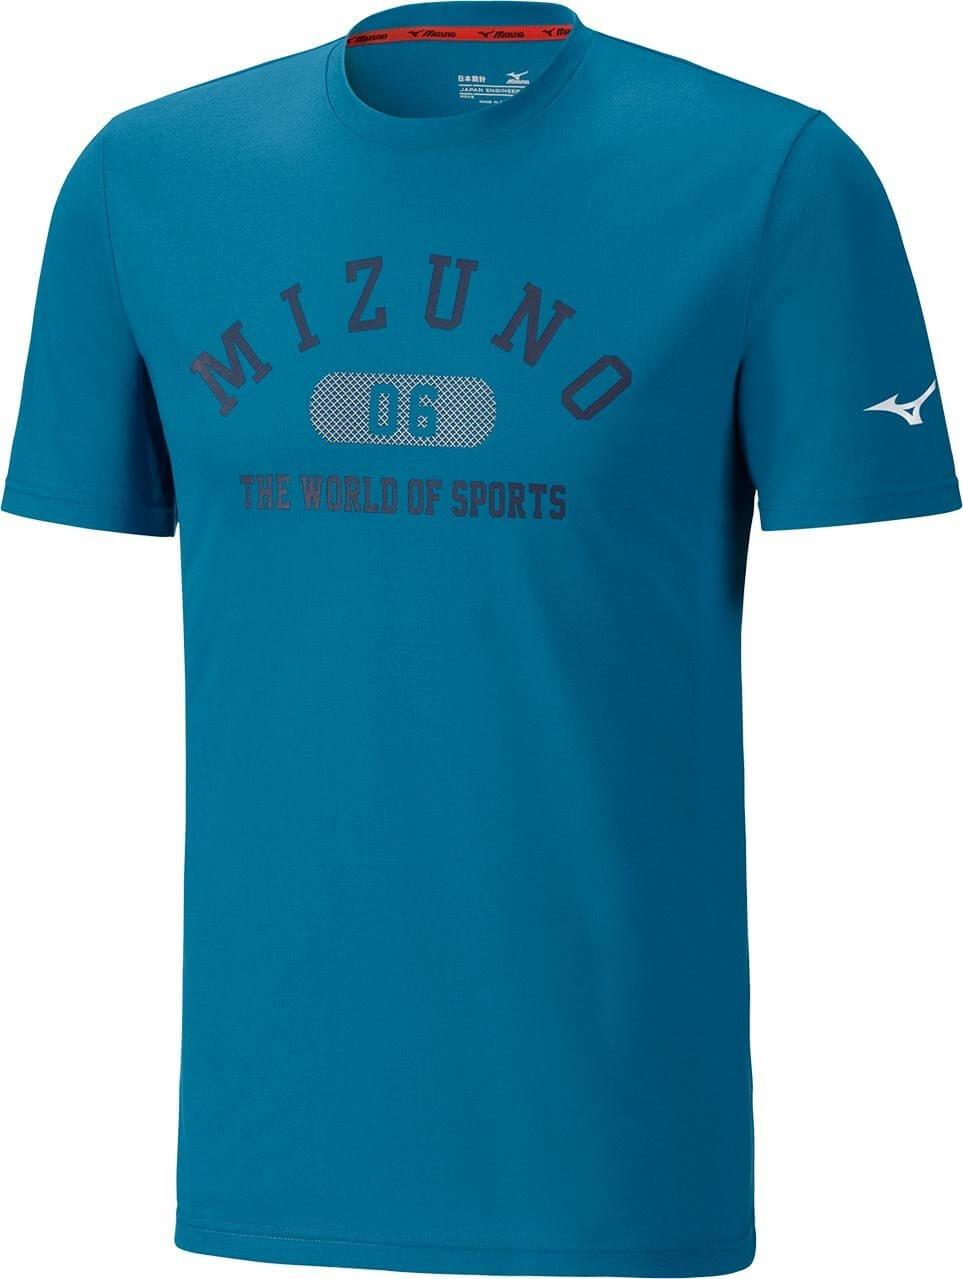 T-Shirts Mizuno Heritage 1906 Tee